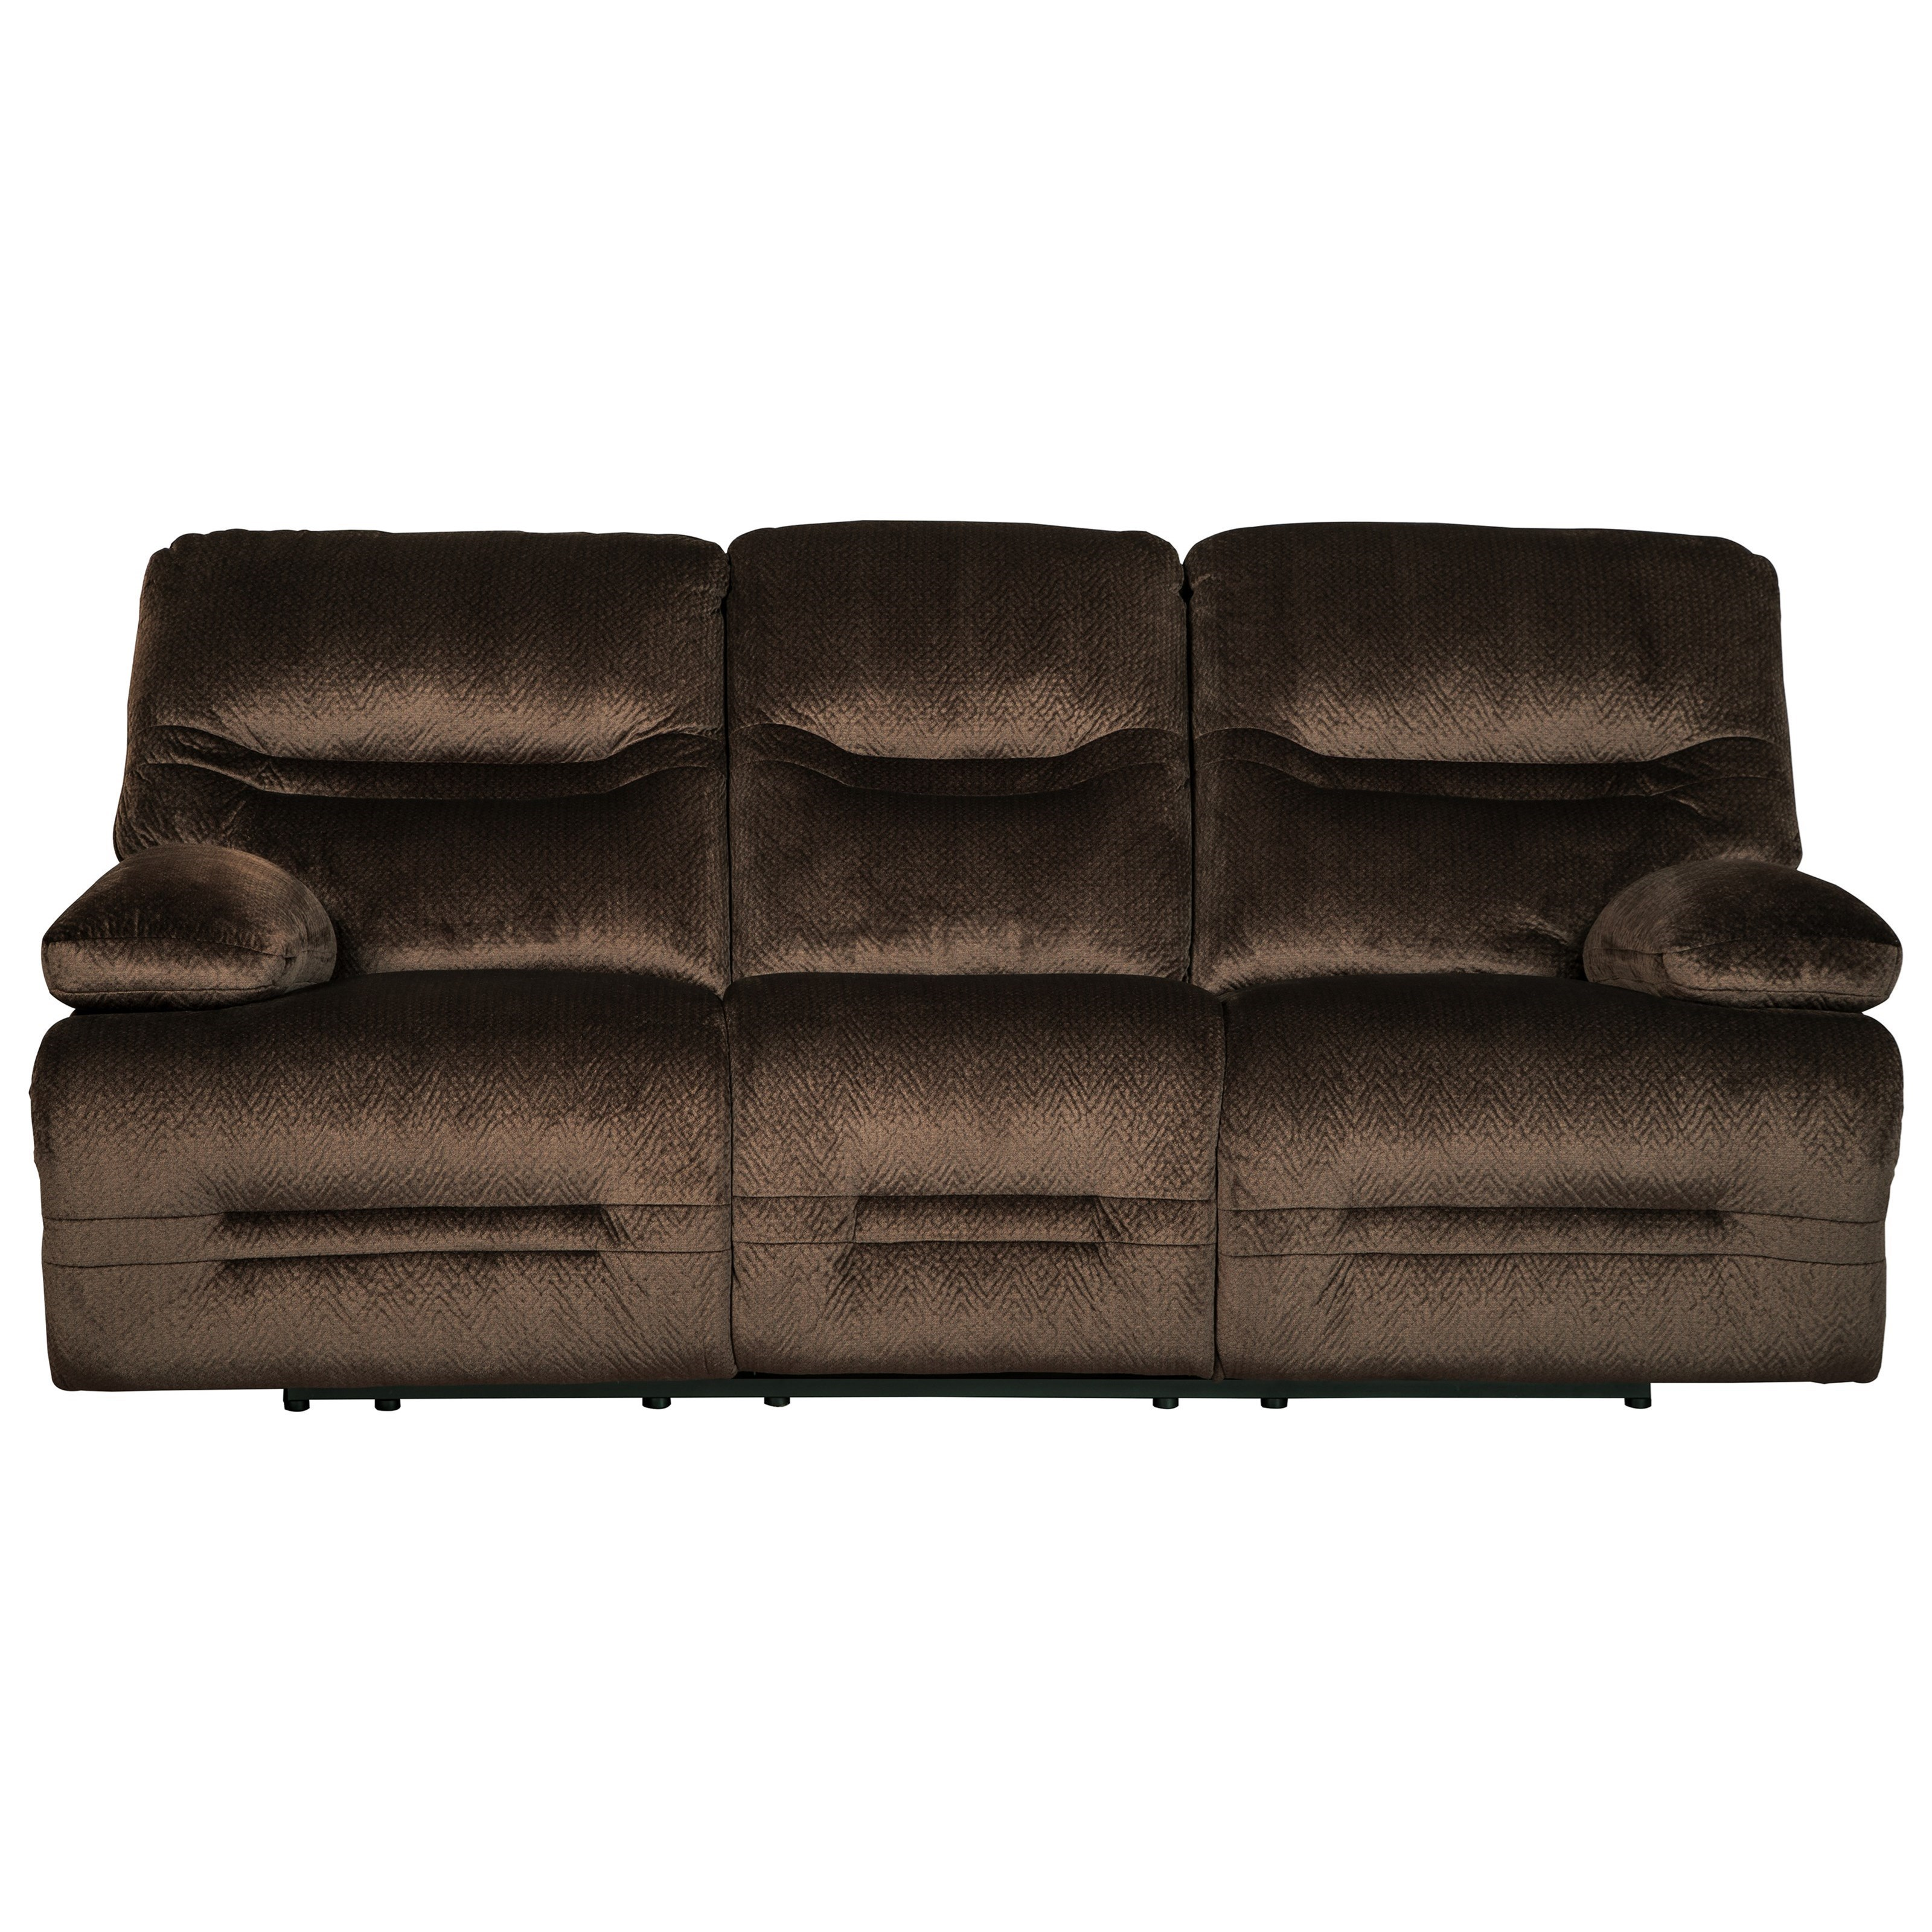 Signature Design By Ashley Brayburn Contemporary Reclining Sofa